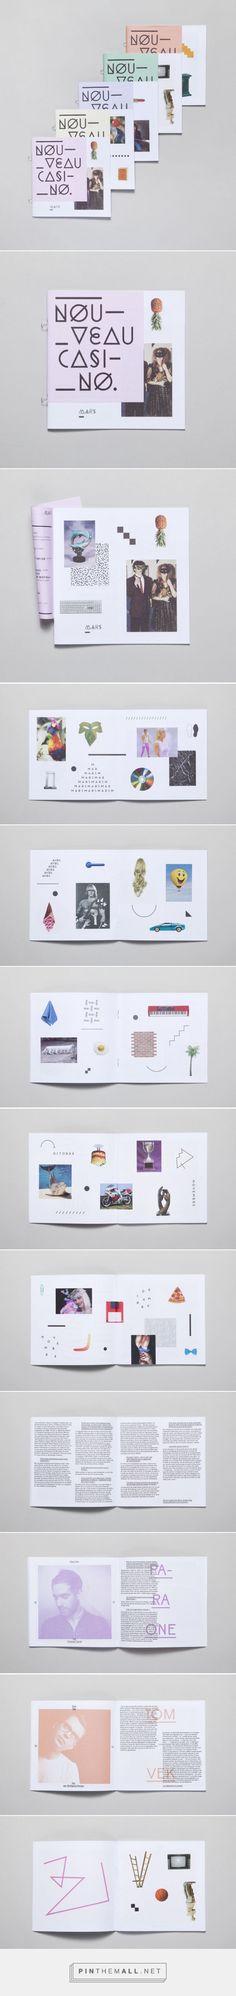 Ill Studio - Nouveau Casino booklet - created via http://pinthemall.net